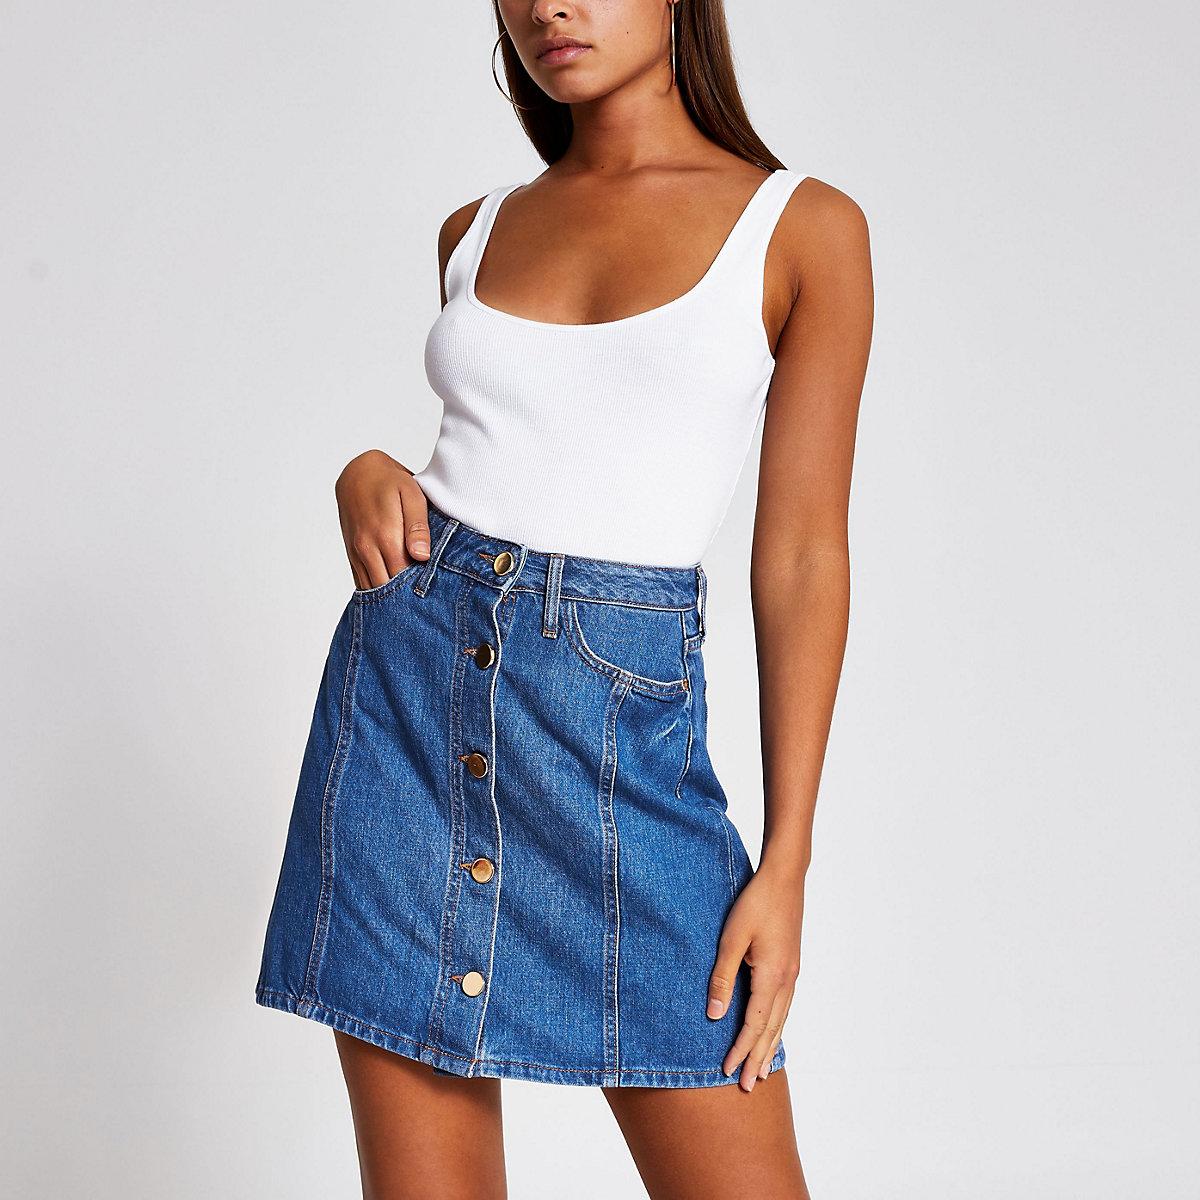 Blue button front denim mini skirt